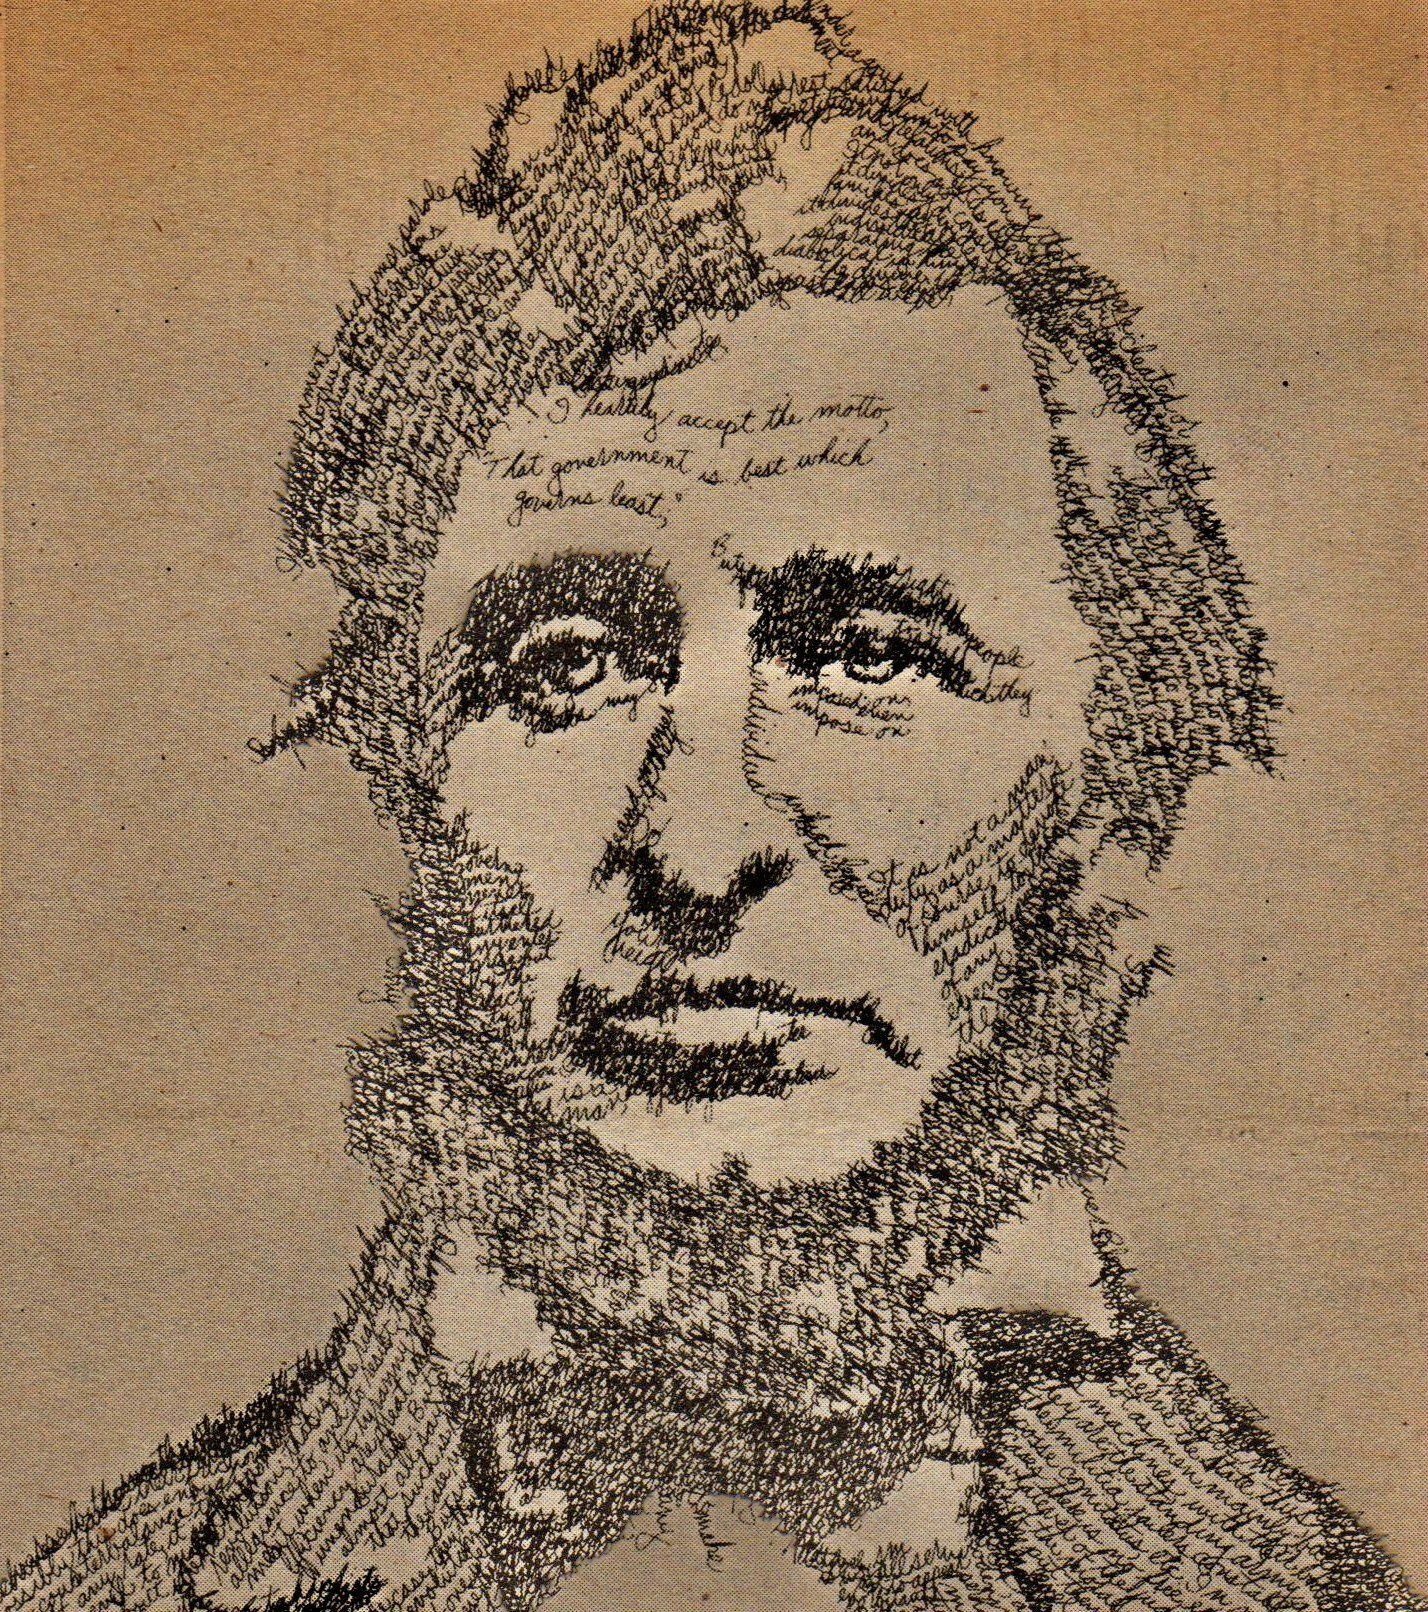 Thoreau As Civil Disobedience By John Sokol Elementary Art Art Artist